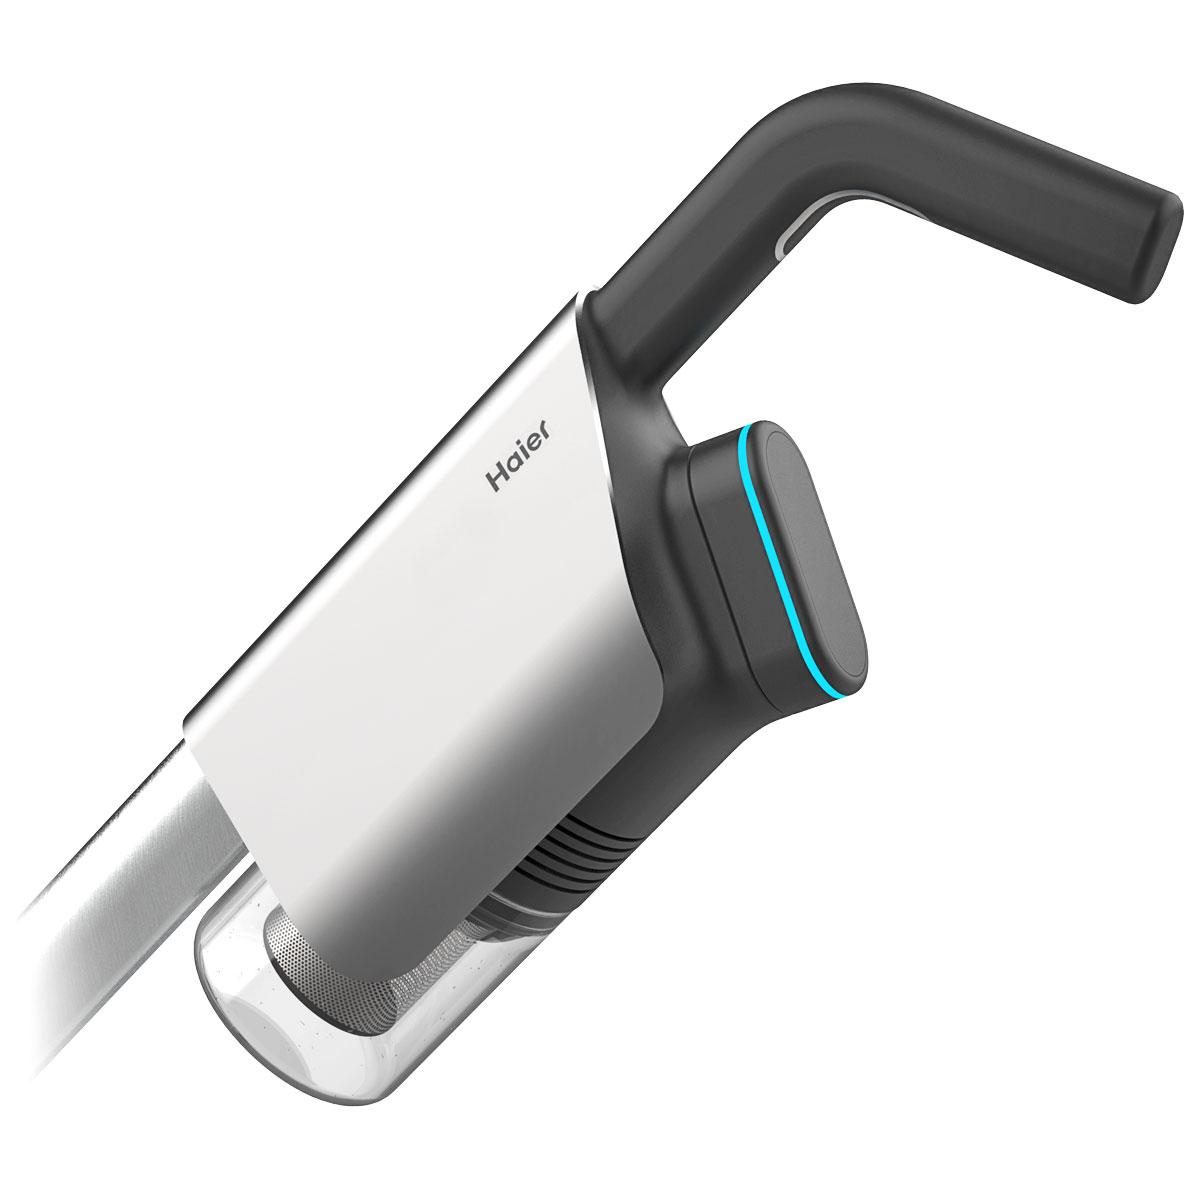 Haushaltsgeräte für Haier Group